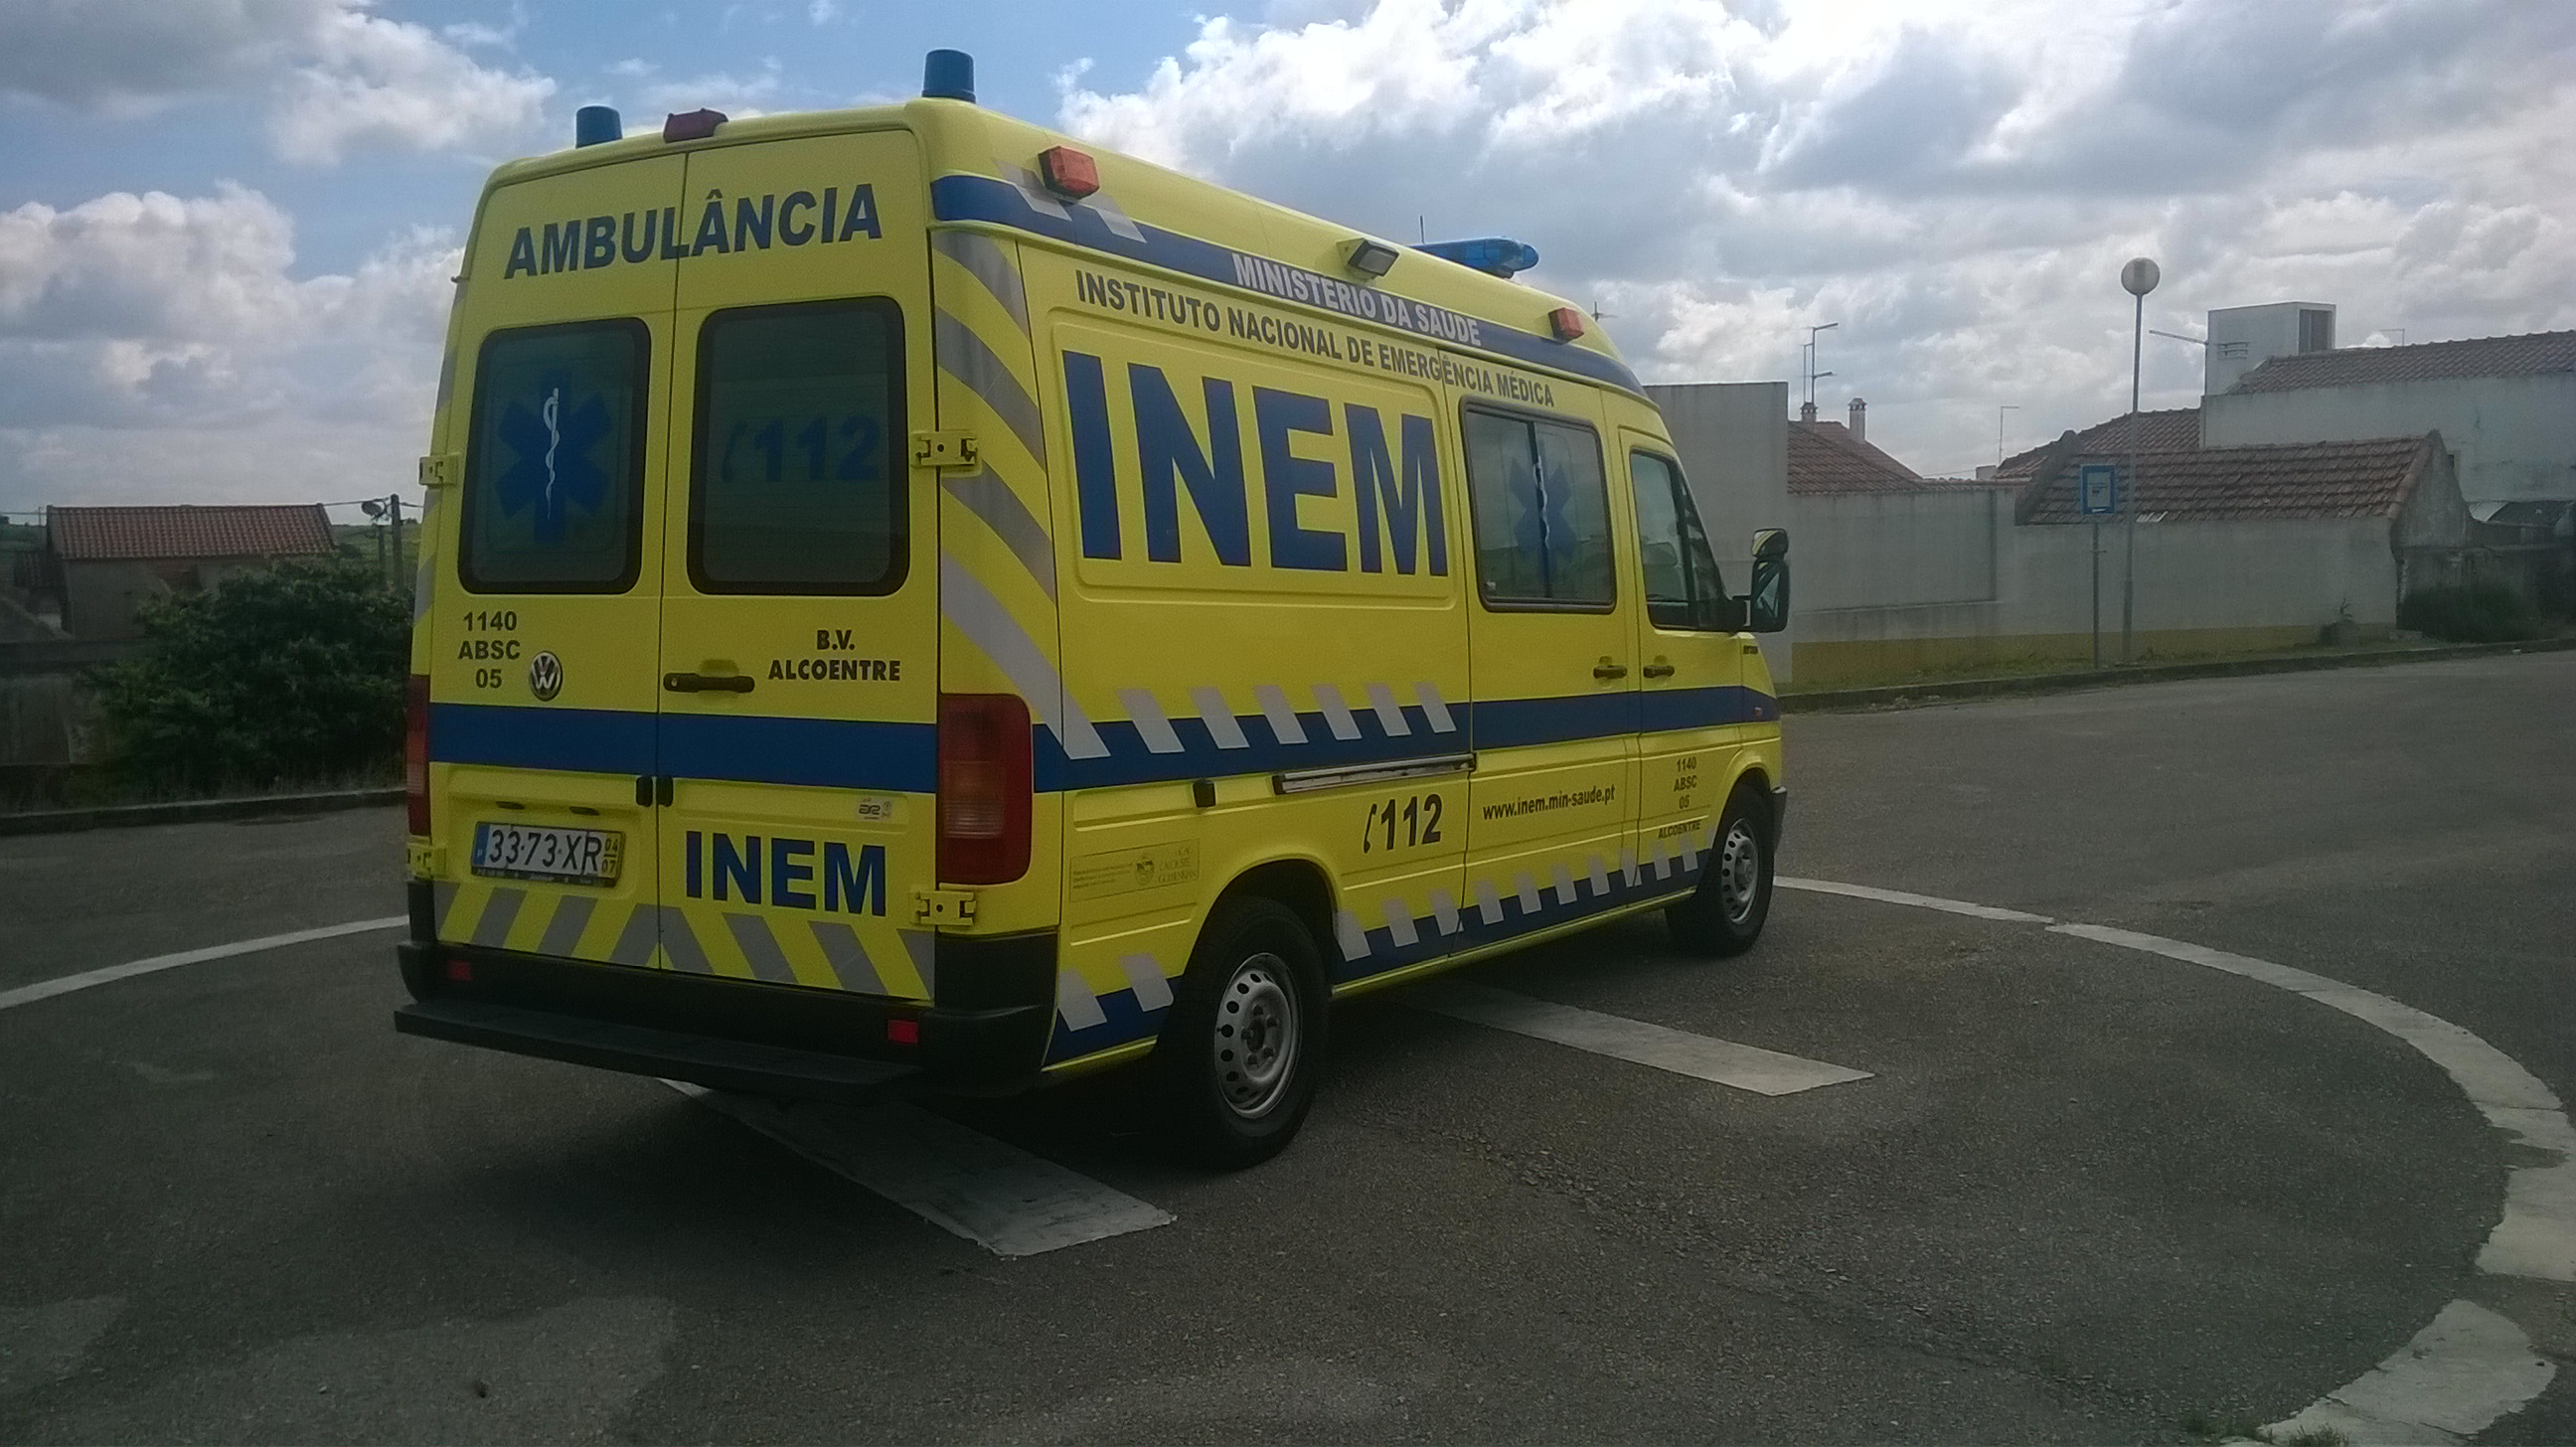 ABSC 05 - INEM